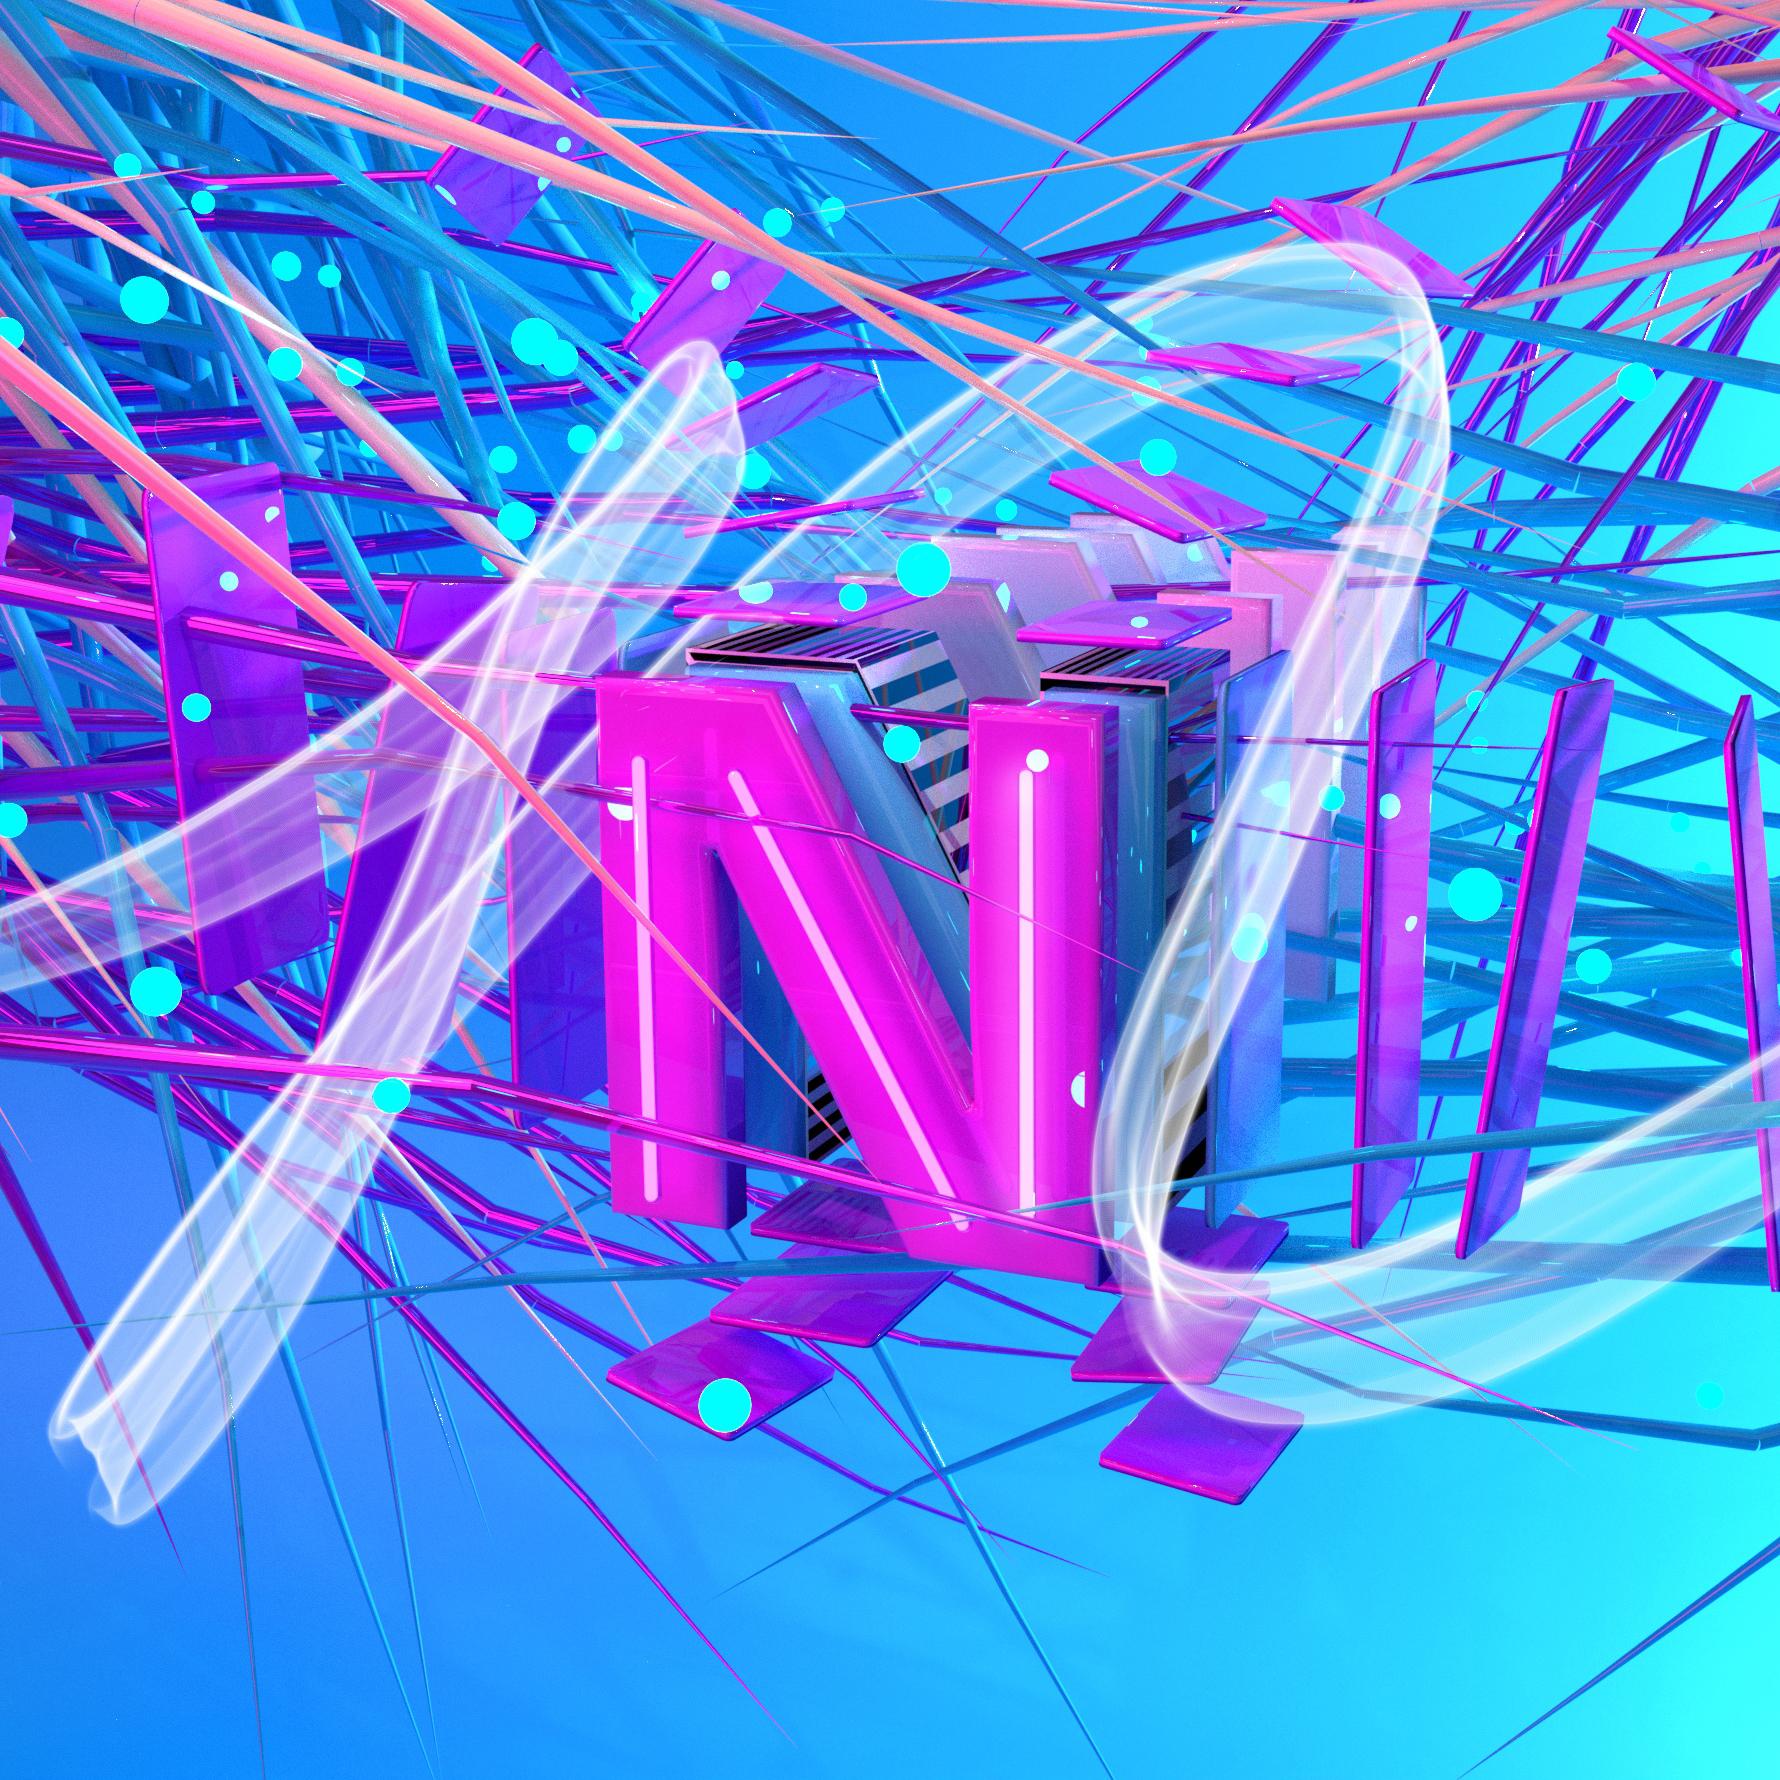 chris-winterton-N-typography-3D-36daysoftype.jpg